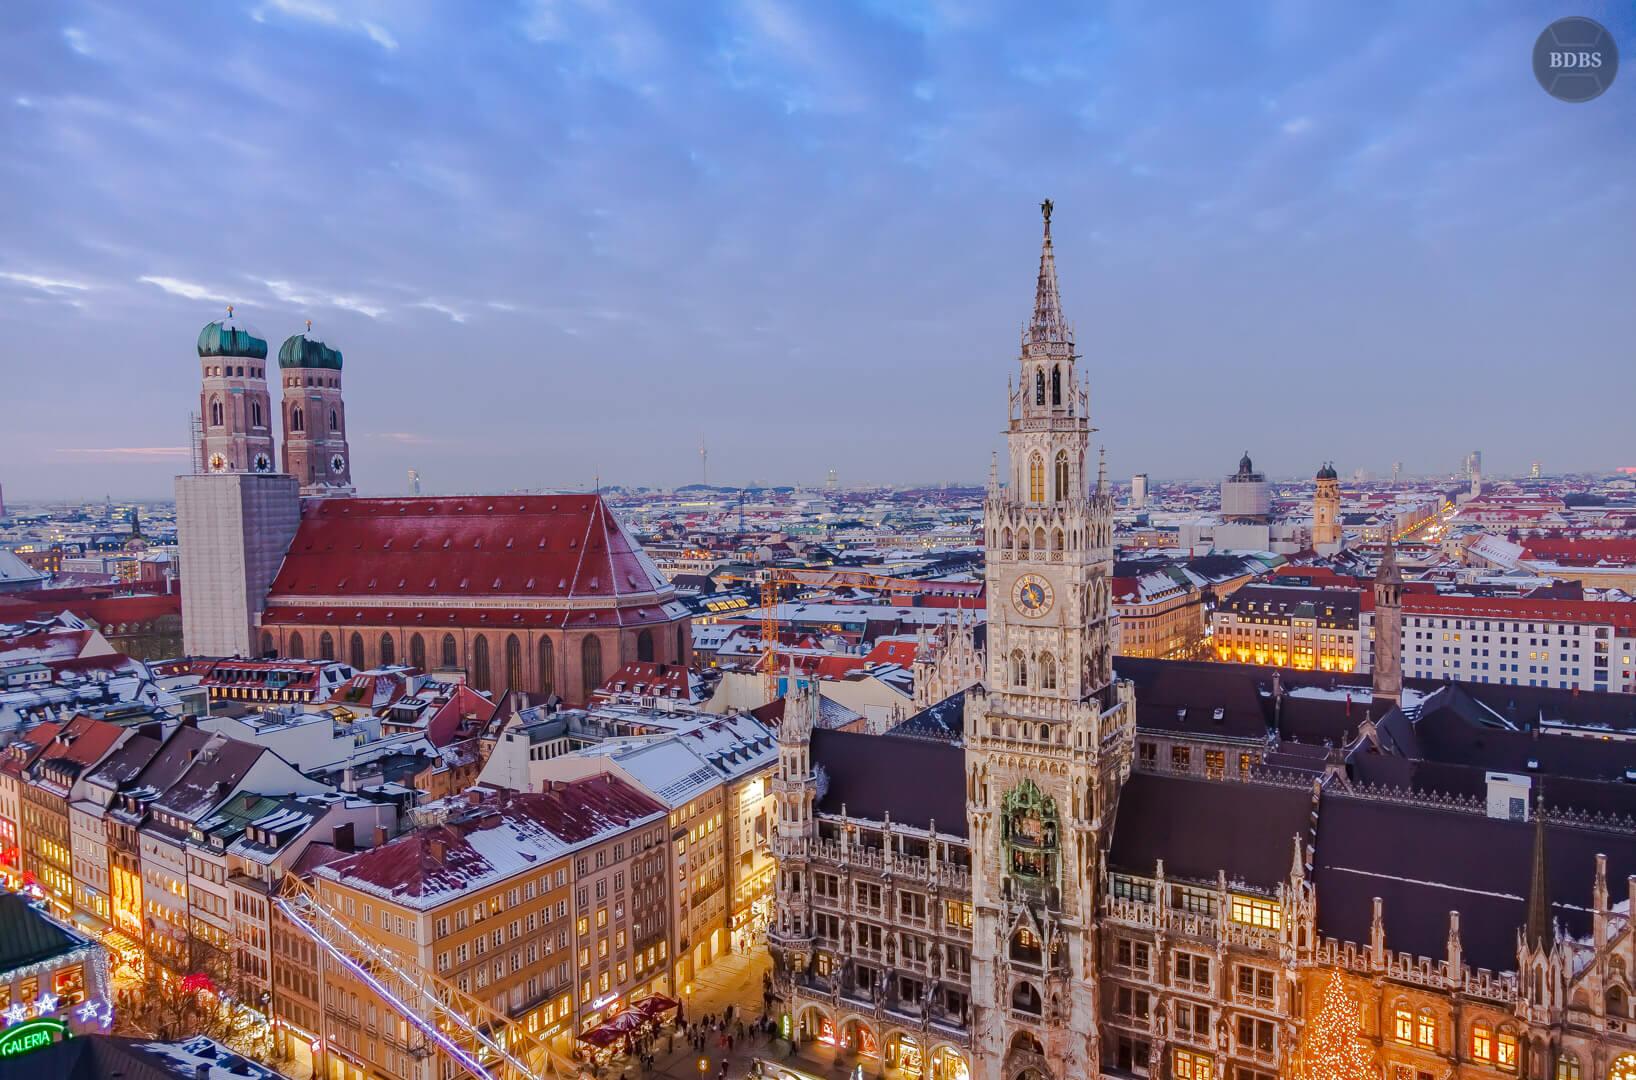 Skyline München Blick vom Alten Peter HDR (1/25 Sek - f,4,0 - 24mm - ISO400)